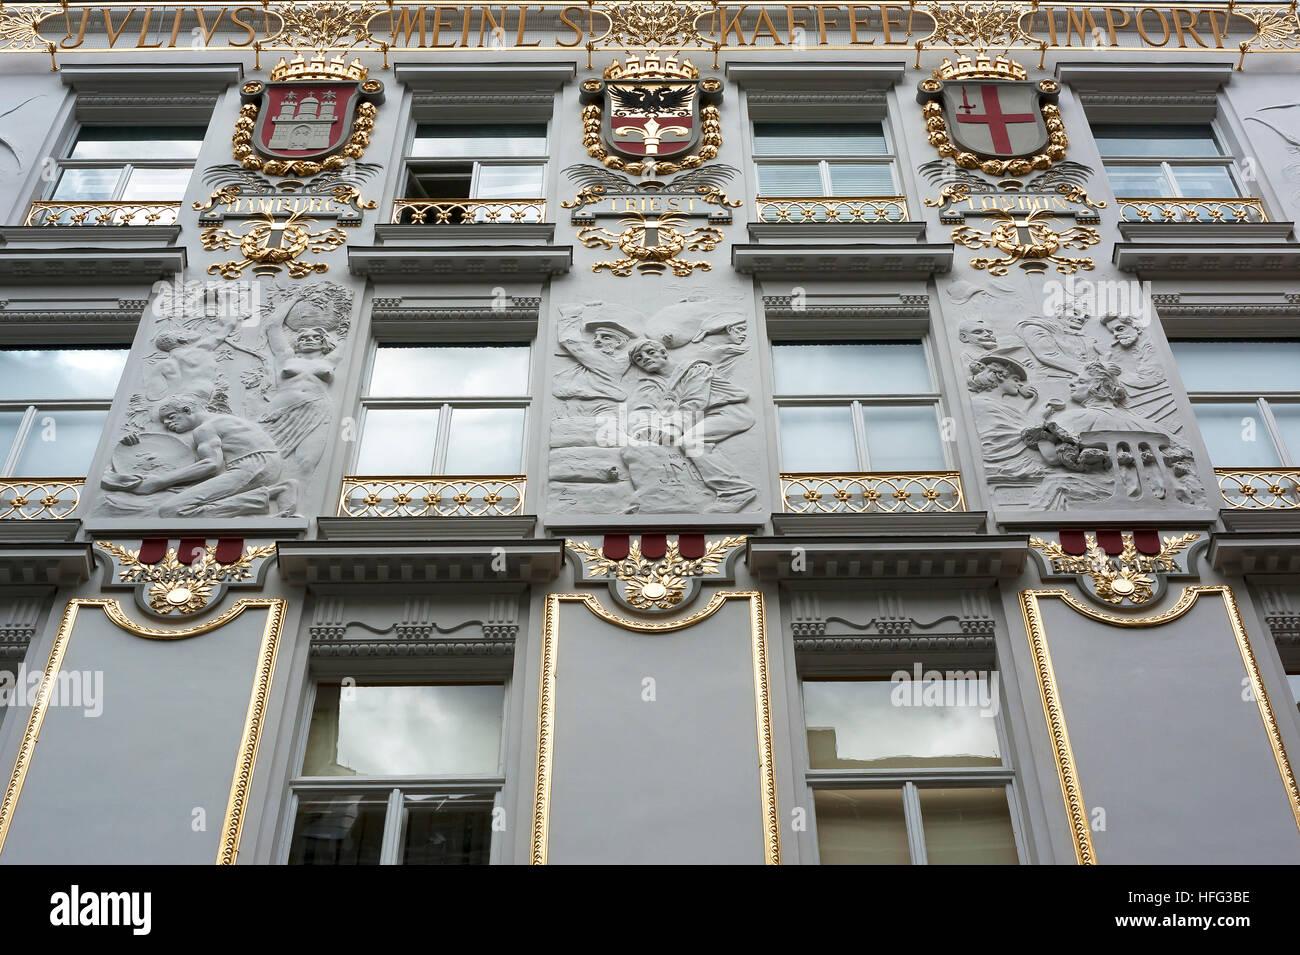 Facade with stucco reliefs, home of coffee roaster Julius Meinl, Vienna, Austria - Stock Image